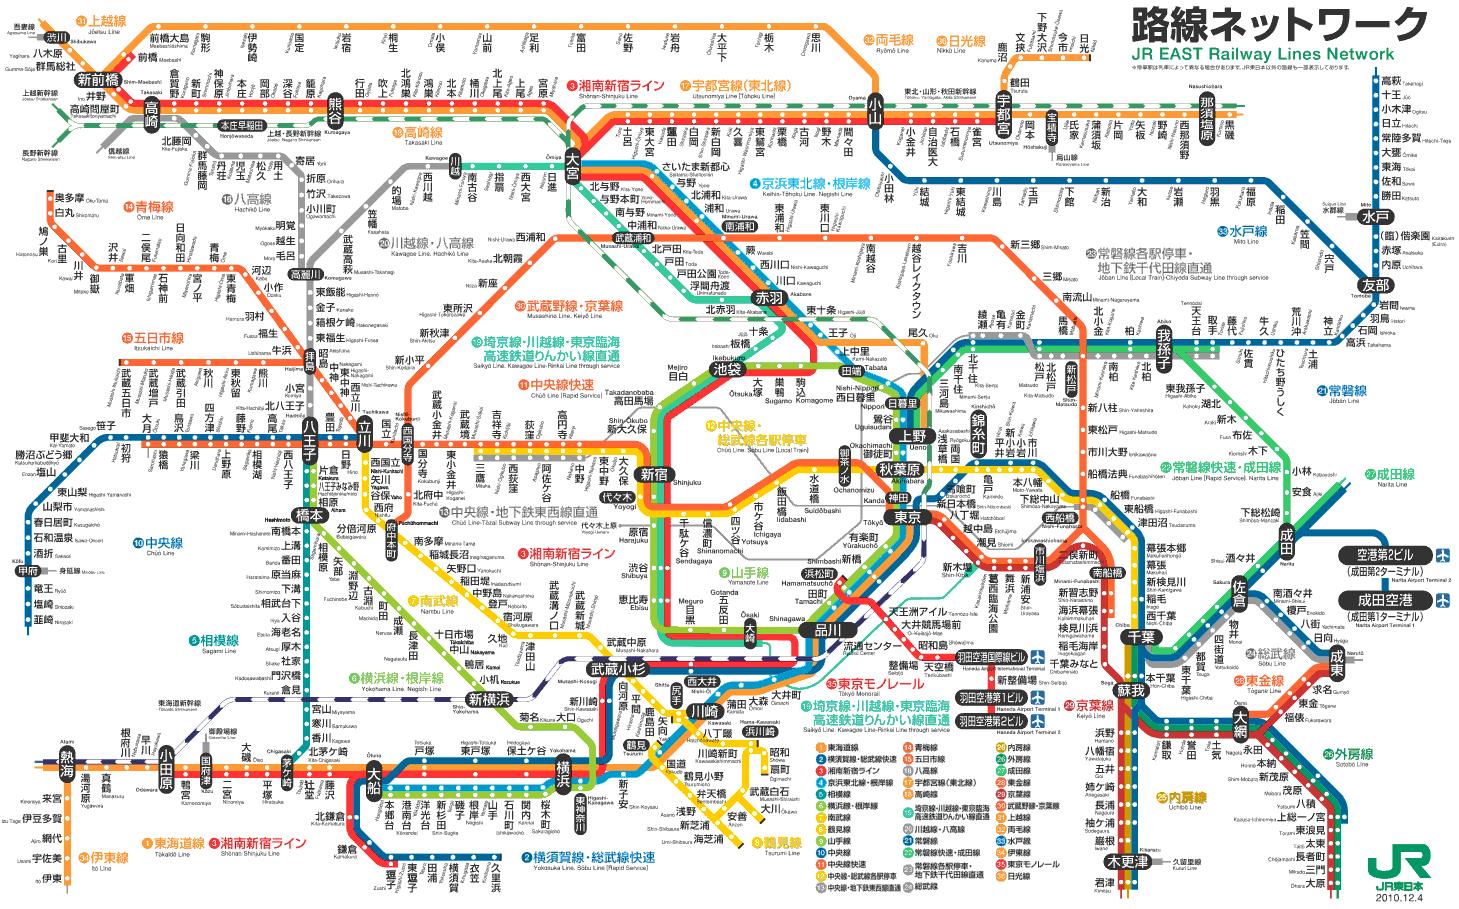 JR東日本_東京近郊路線図